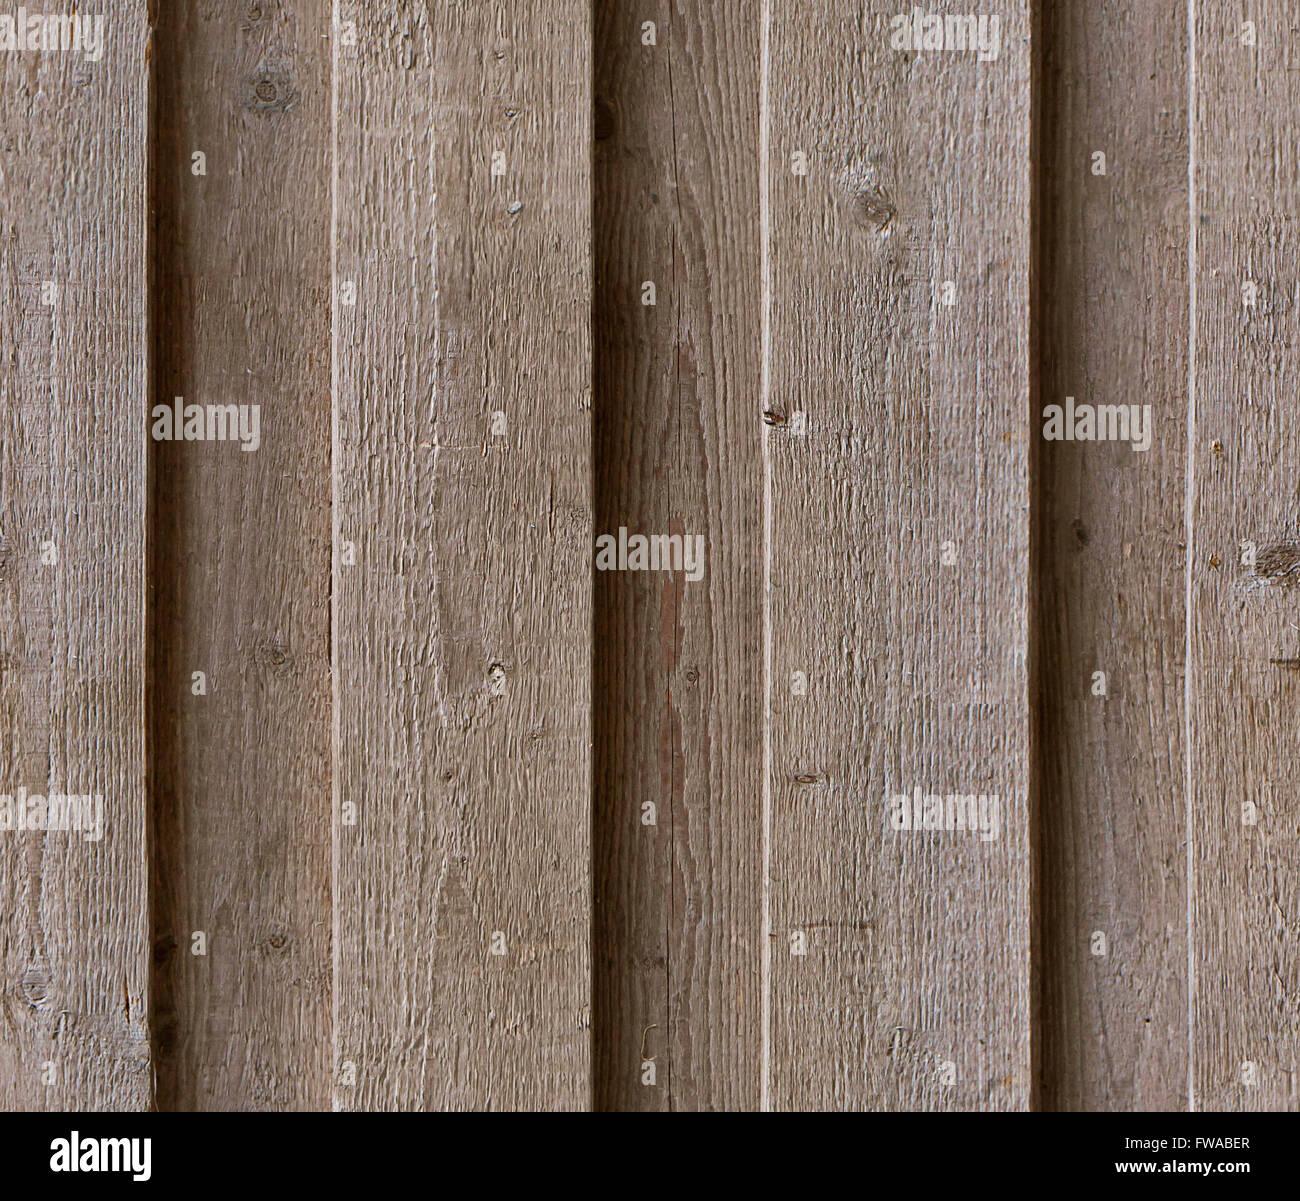 hd seamless texture stockfotos hd seamless texture bilder alamy. Black Bedroom Furniture Sets. Home Design Ideas